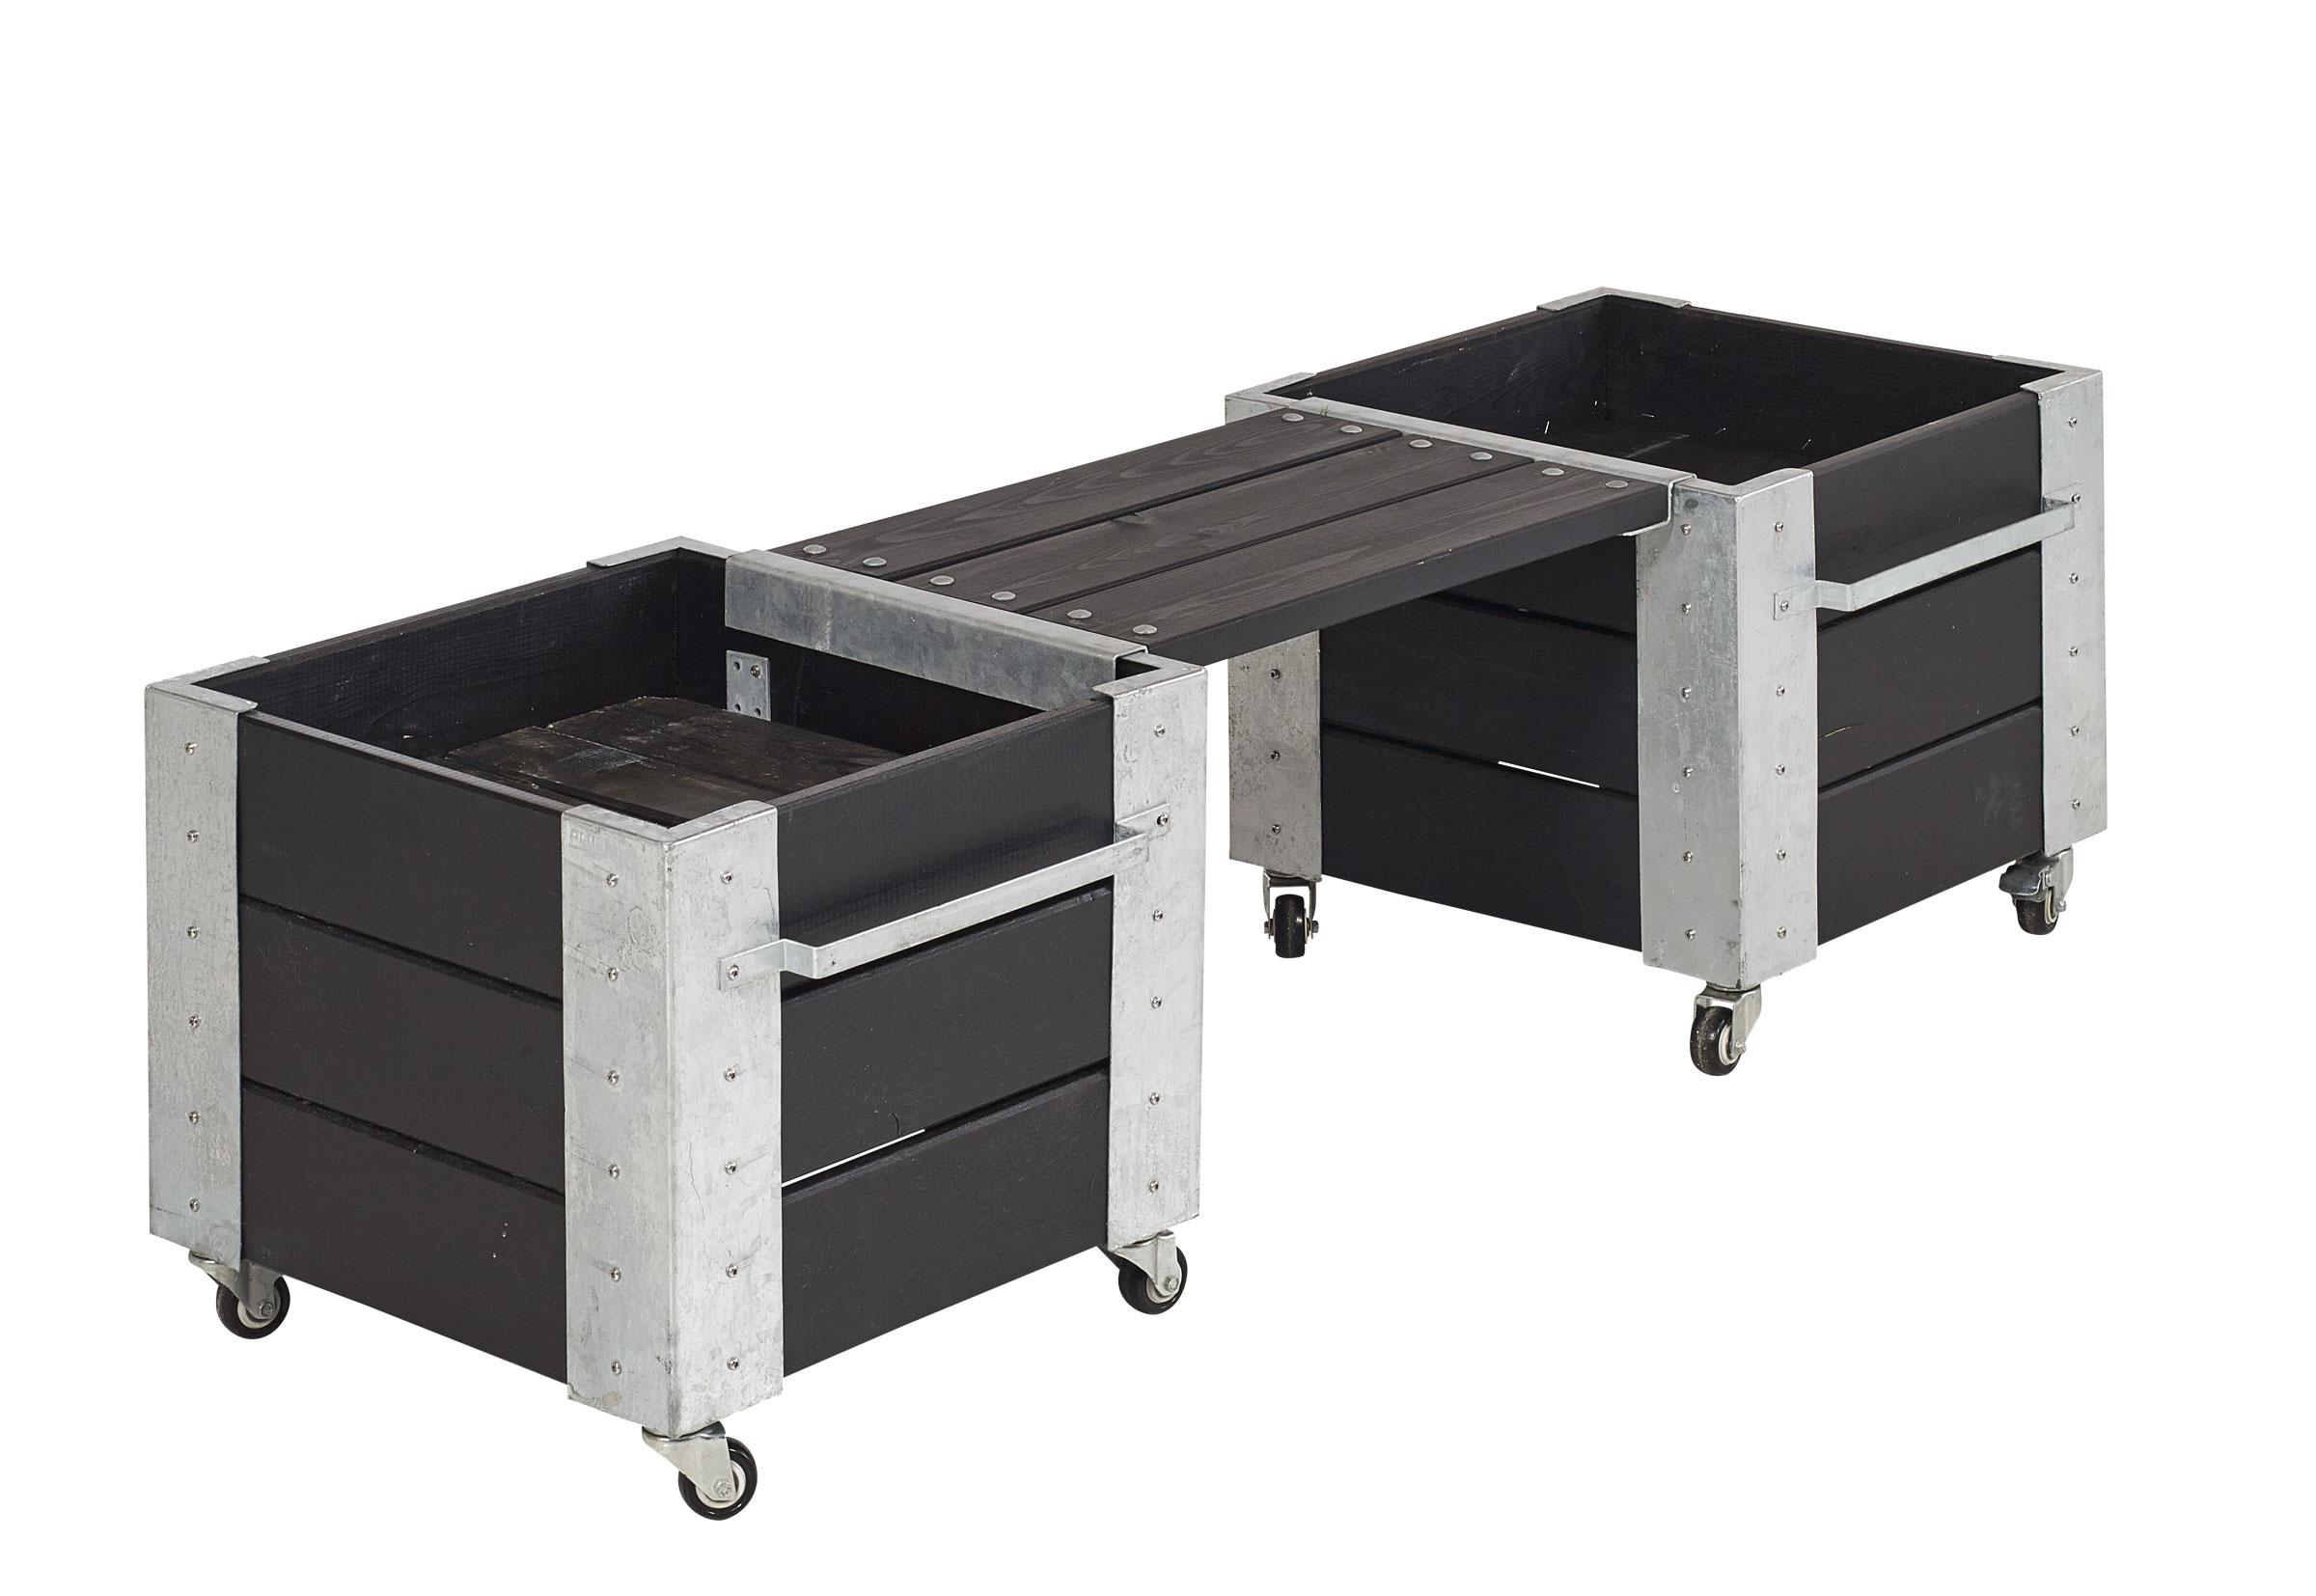 gartenbank mit stoff bekleben m bel und heimat design inspiration. Black Bedroom Furniture Sets. Home Design Ideas